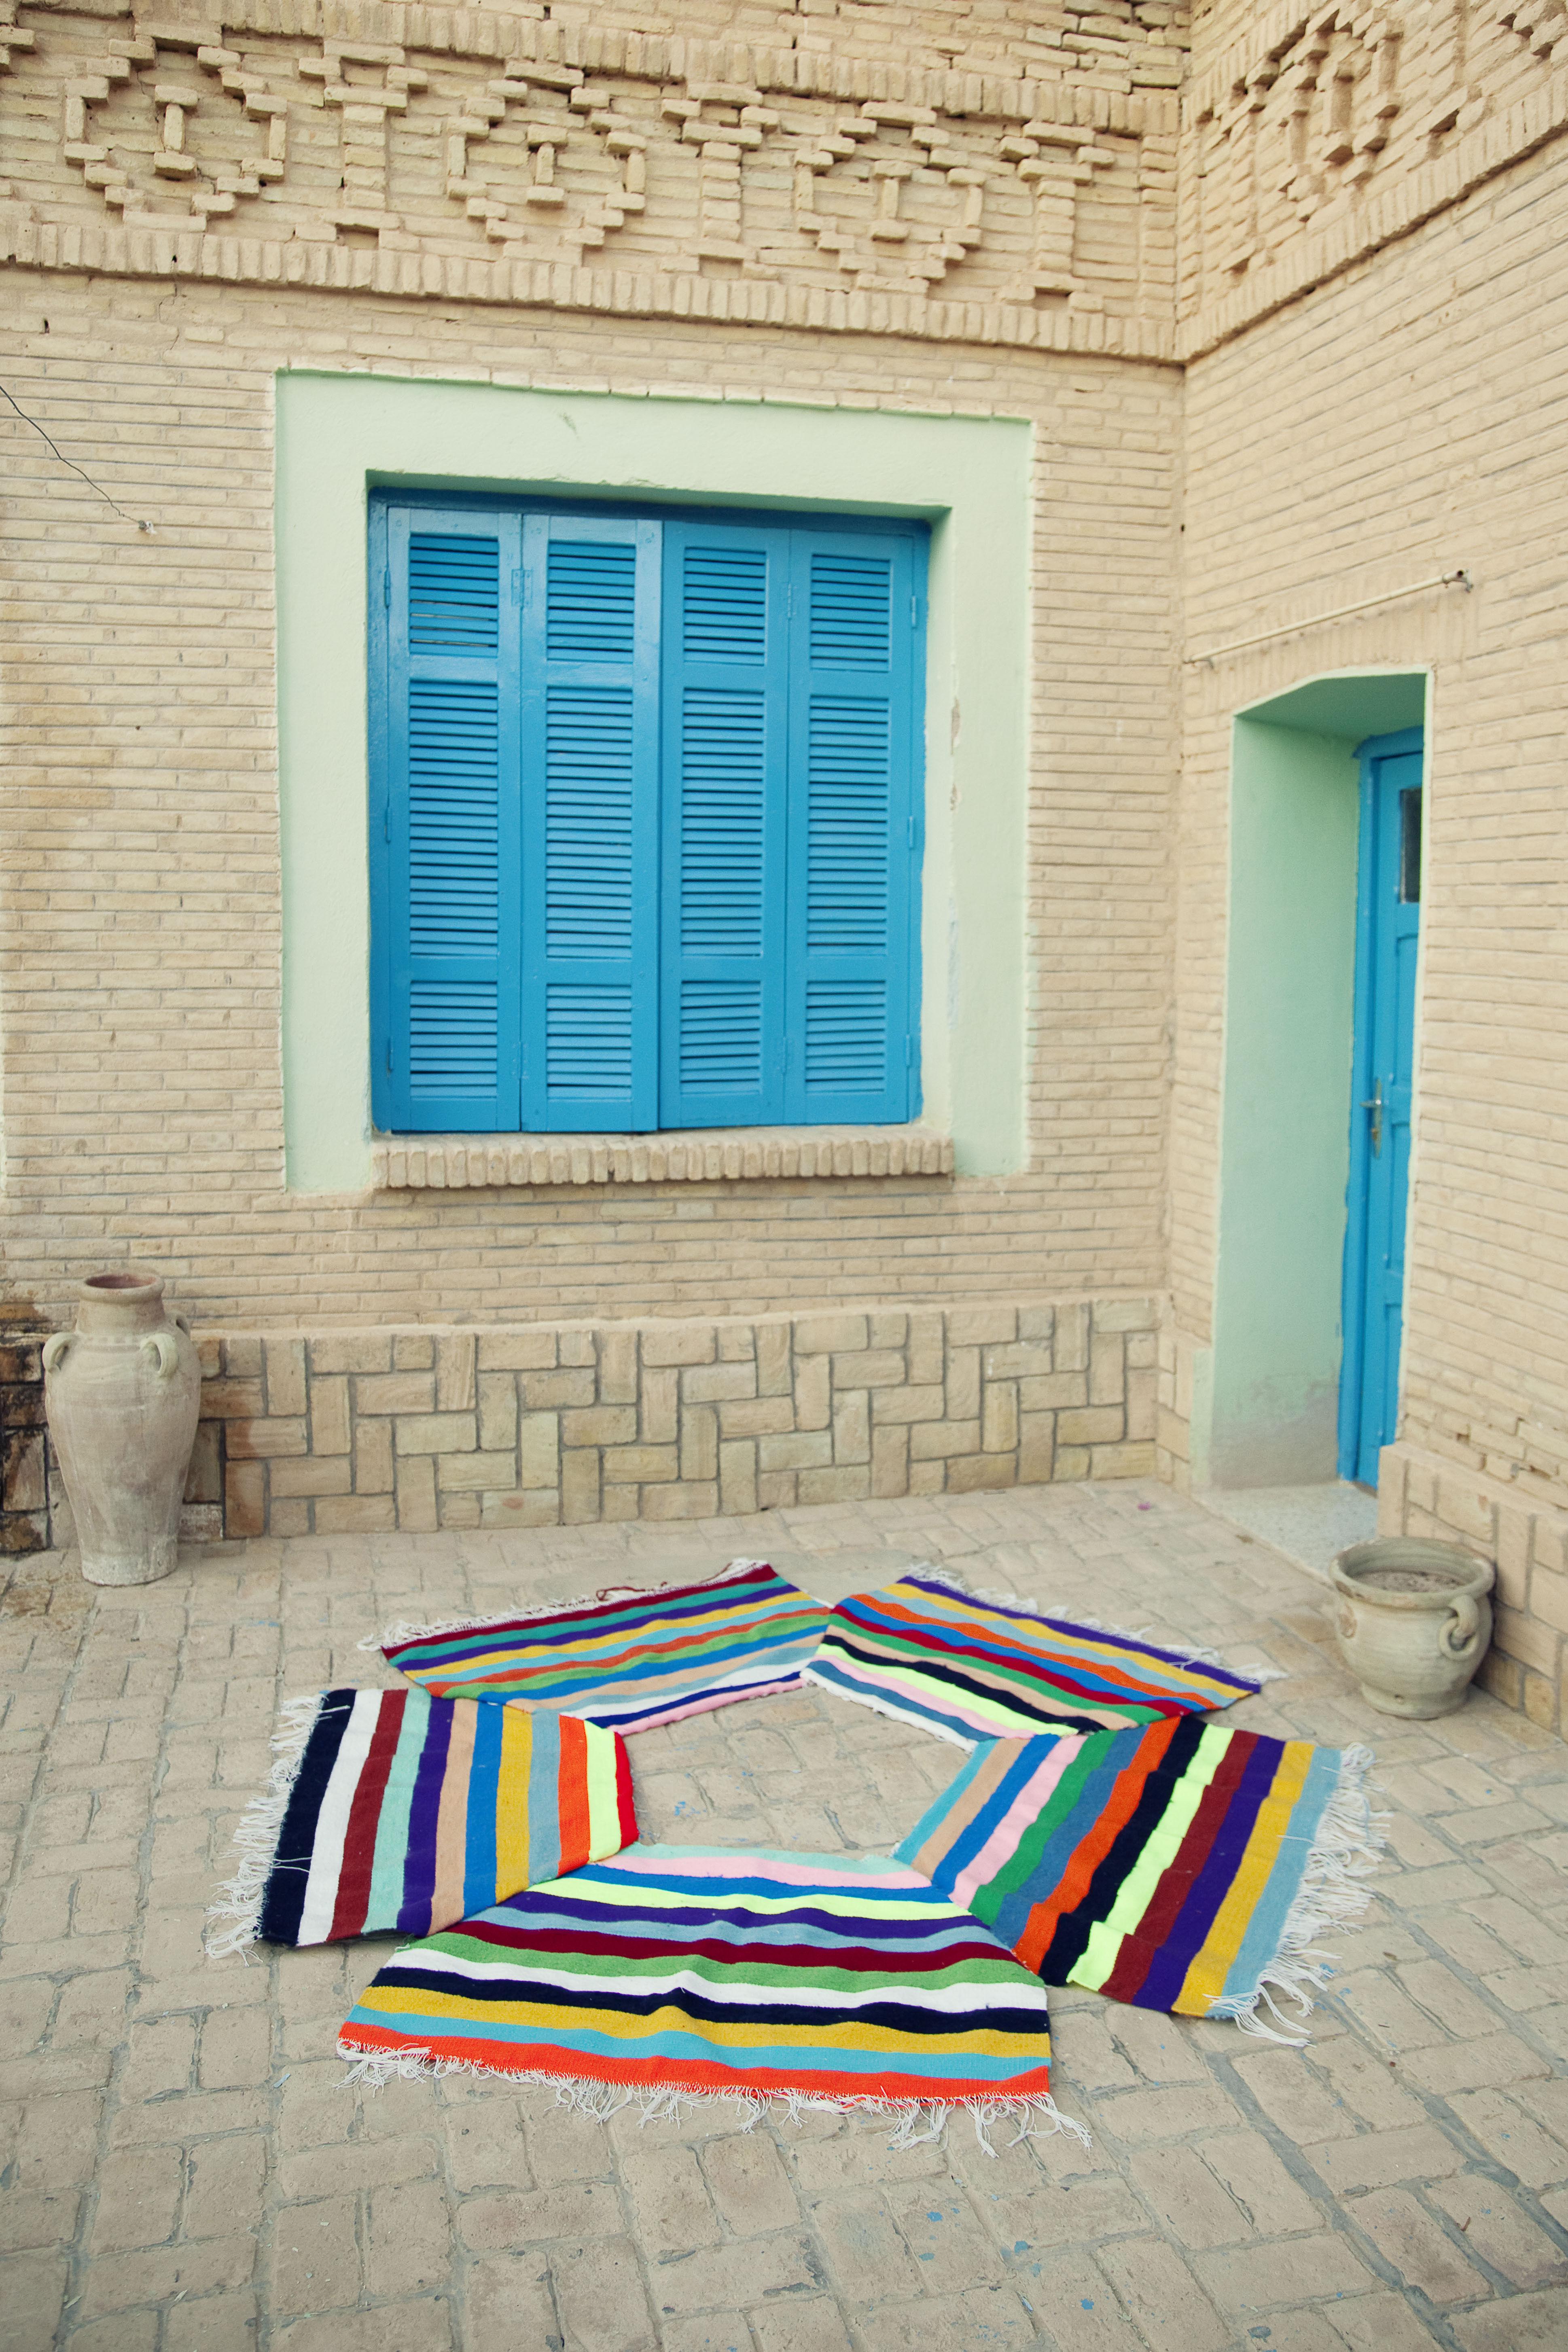 Tapis kilim de convivialit 5 places l 216 cm multicolore made in design ed - Made in design tapis ...